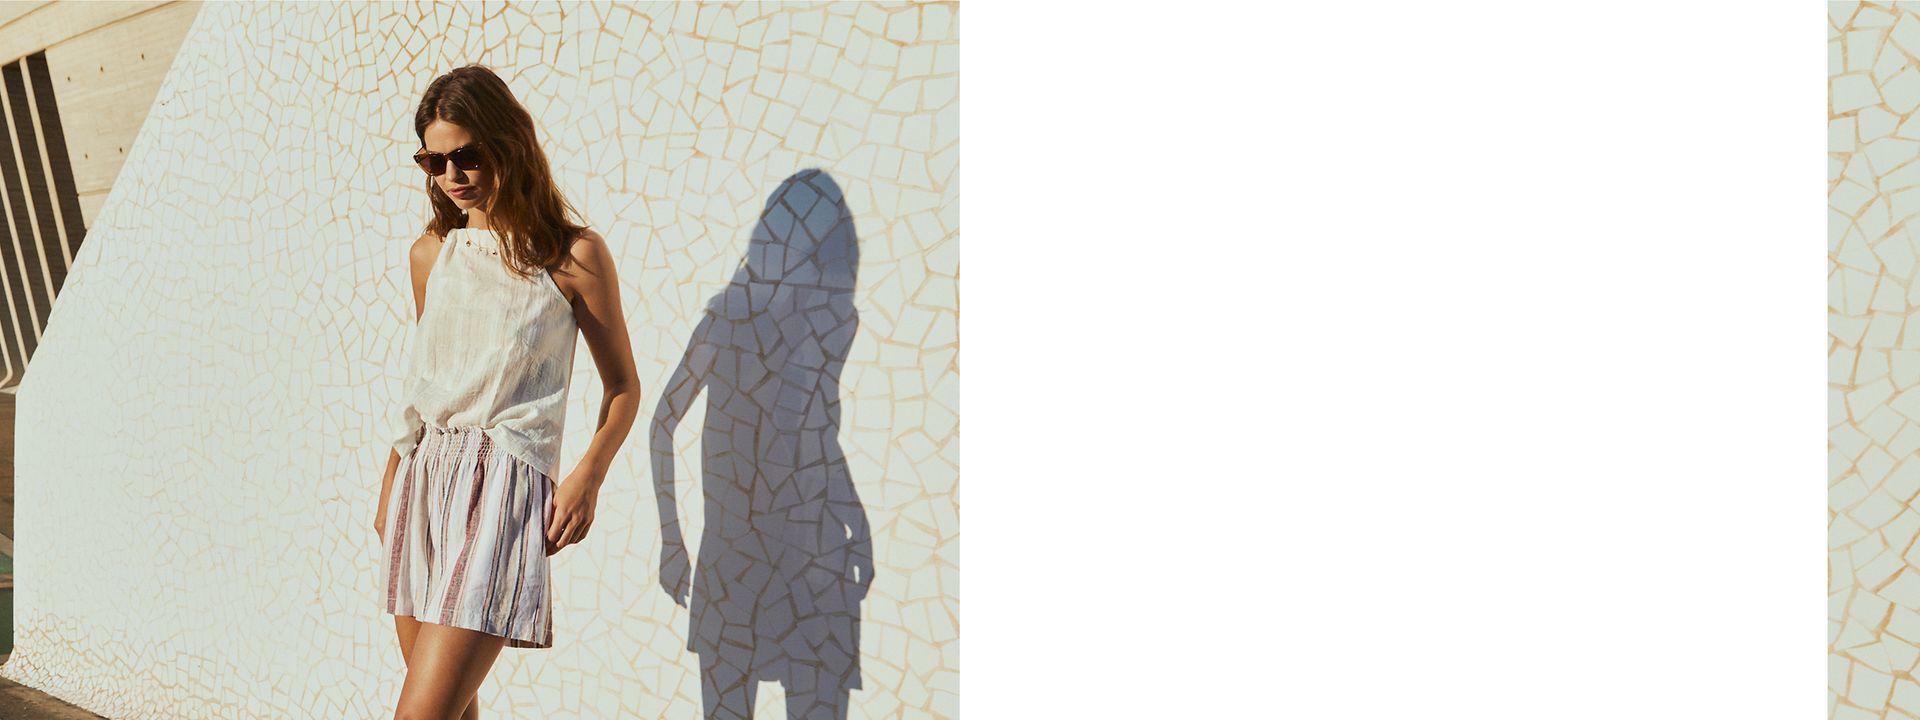 242021 - women - startpage - main banner - estate - sfumature di bianco - IMG